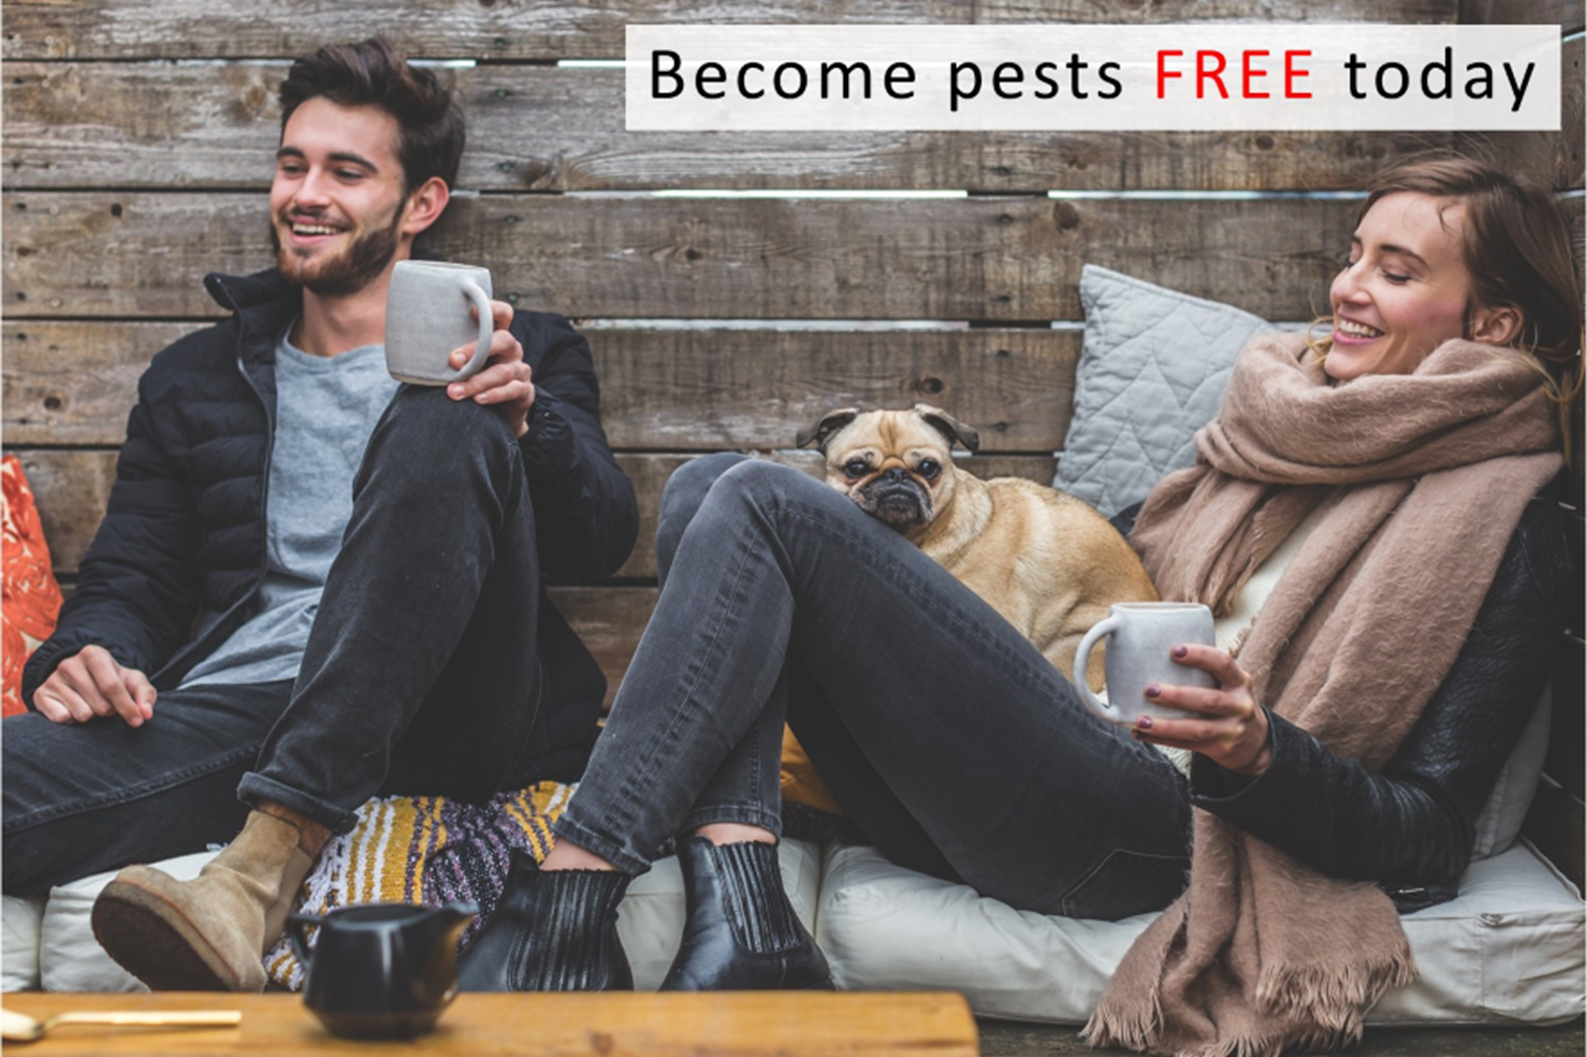 Pest-Control-buget-tips.png